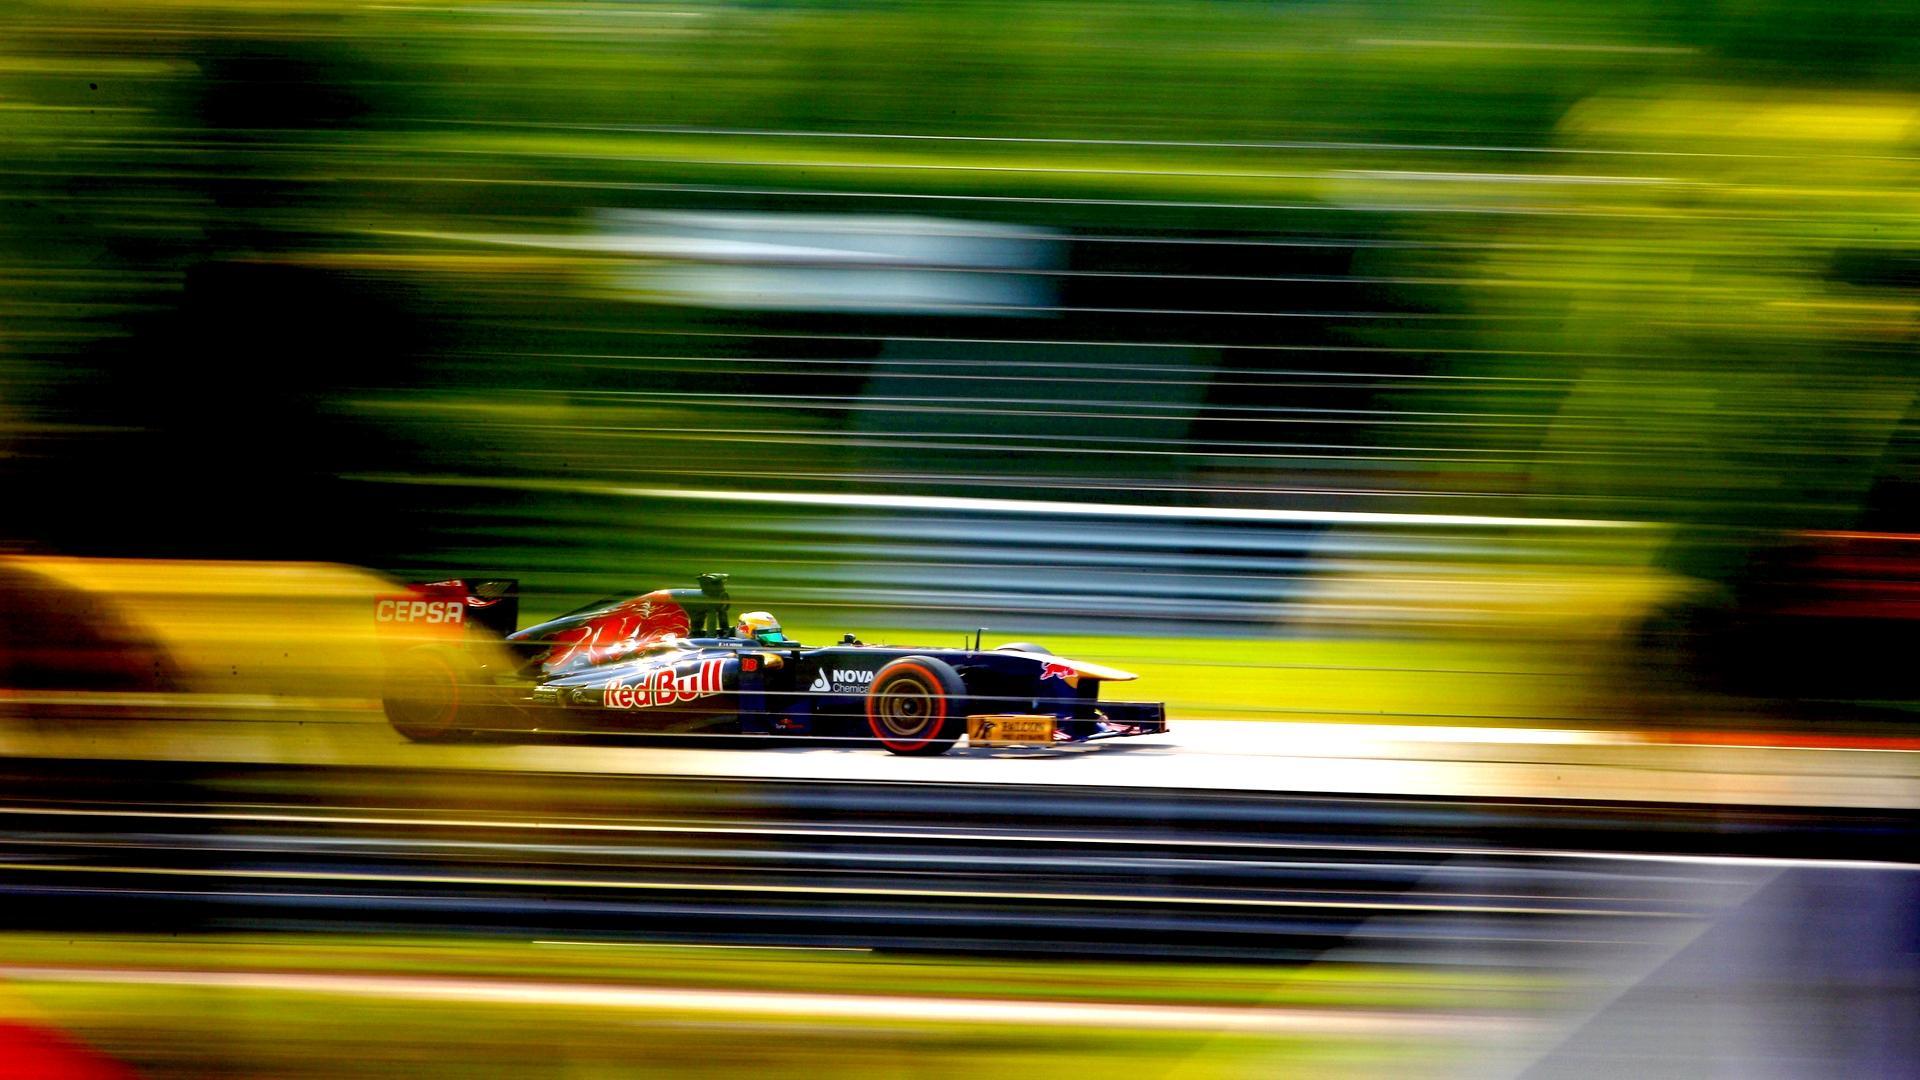 Formula 1 Red Bull Racing Car Race Cars Sport Sports Motion Blur